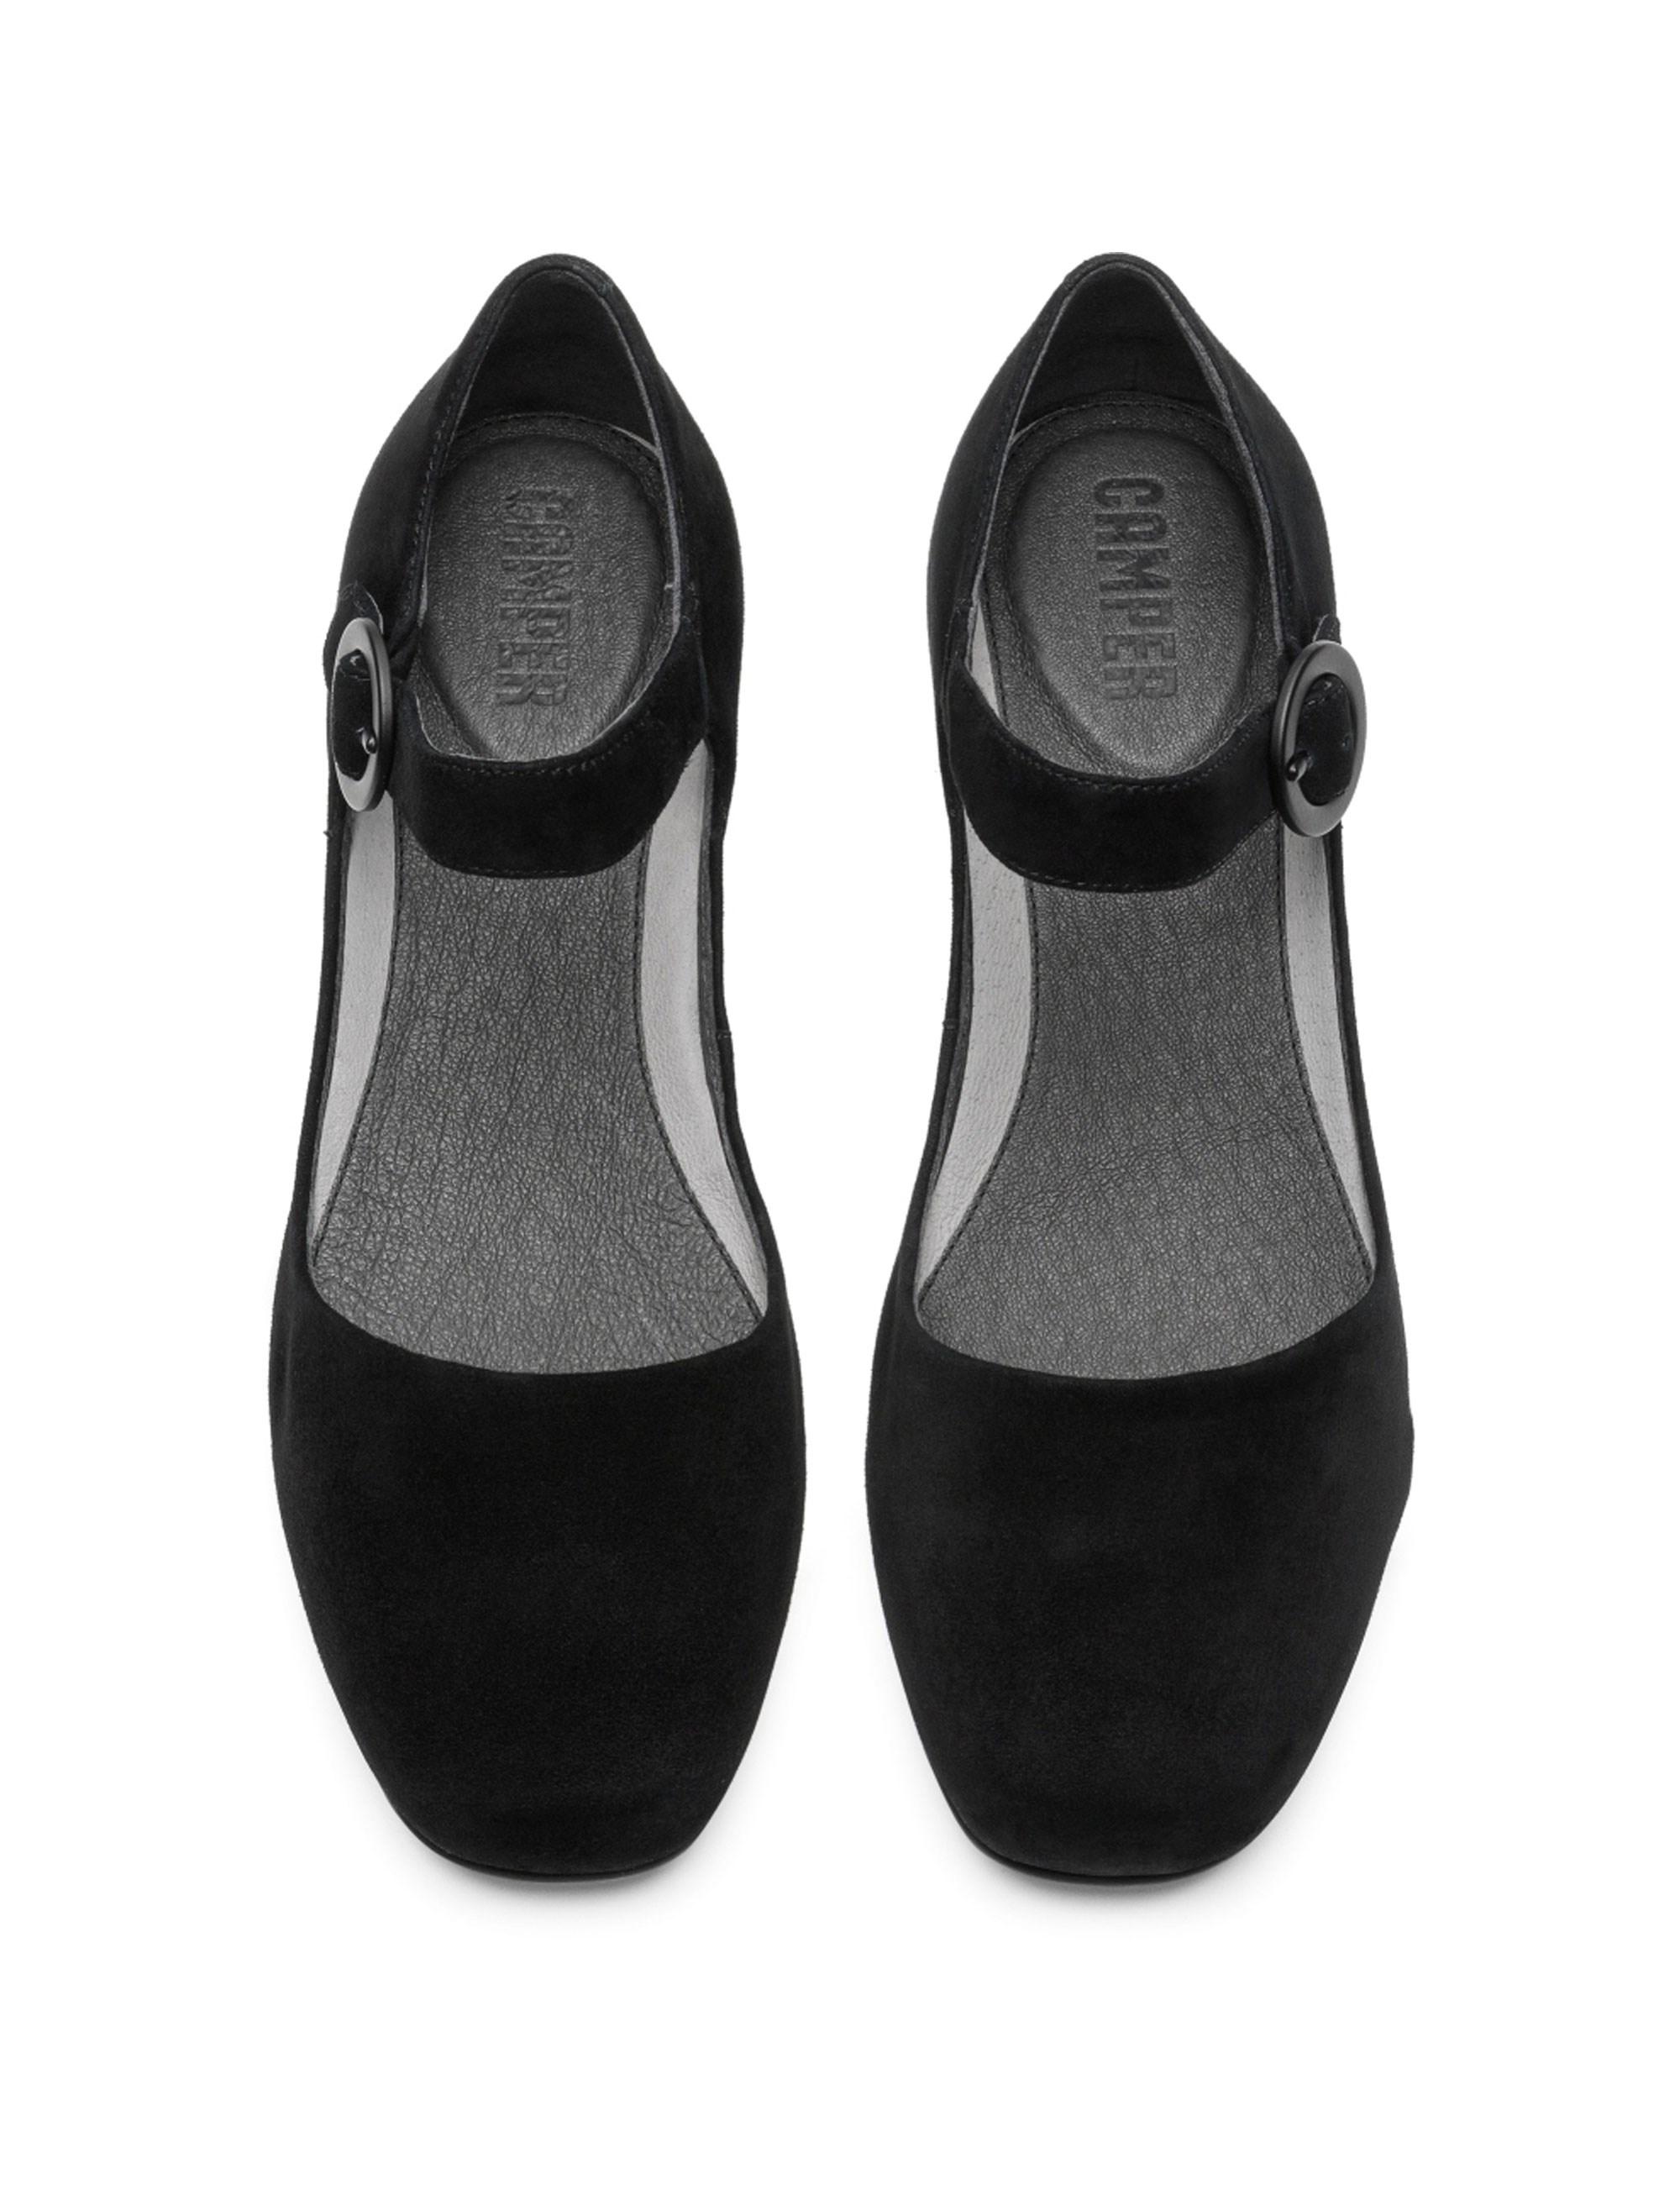 کفش تخت چرم زنانه Lucy - مشکي - 2